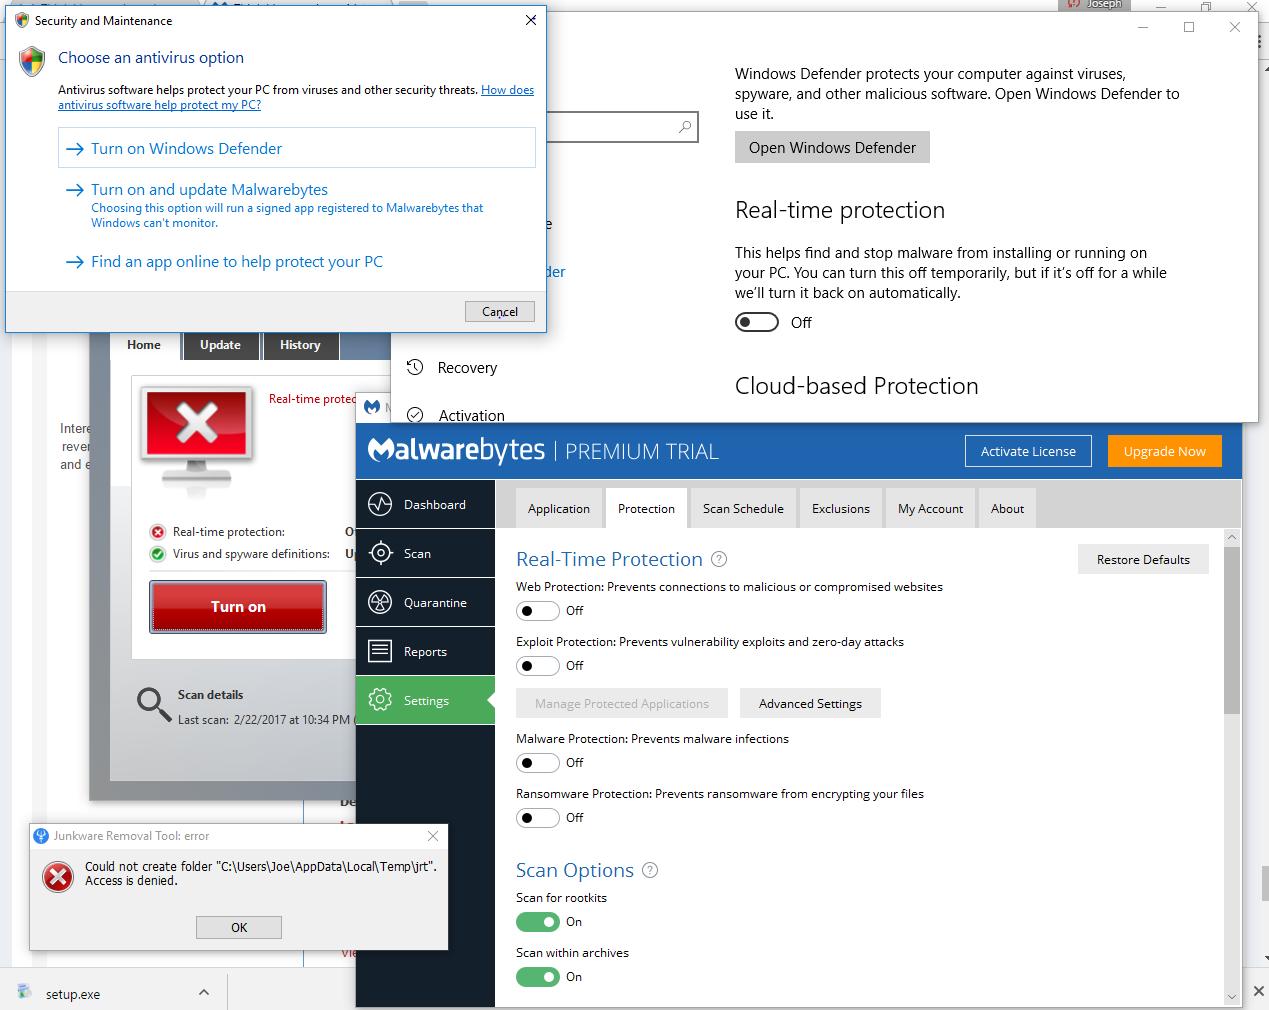 Think I have a virus - Resolved Malware Removal Logs - Malwarebytes Forums